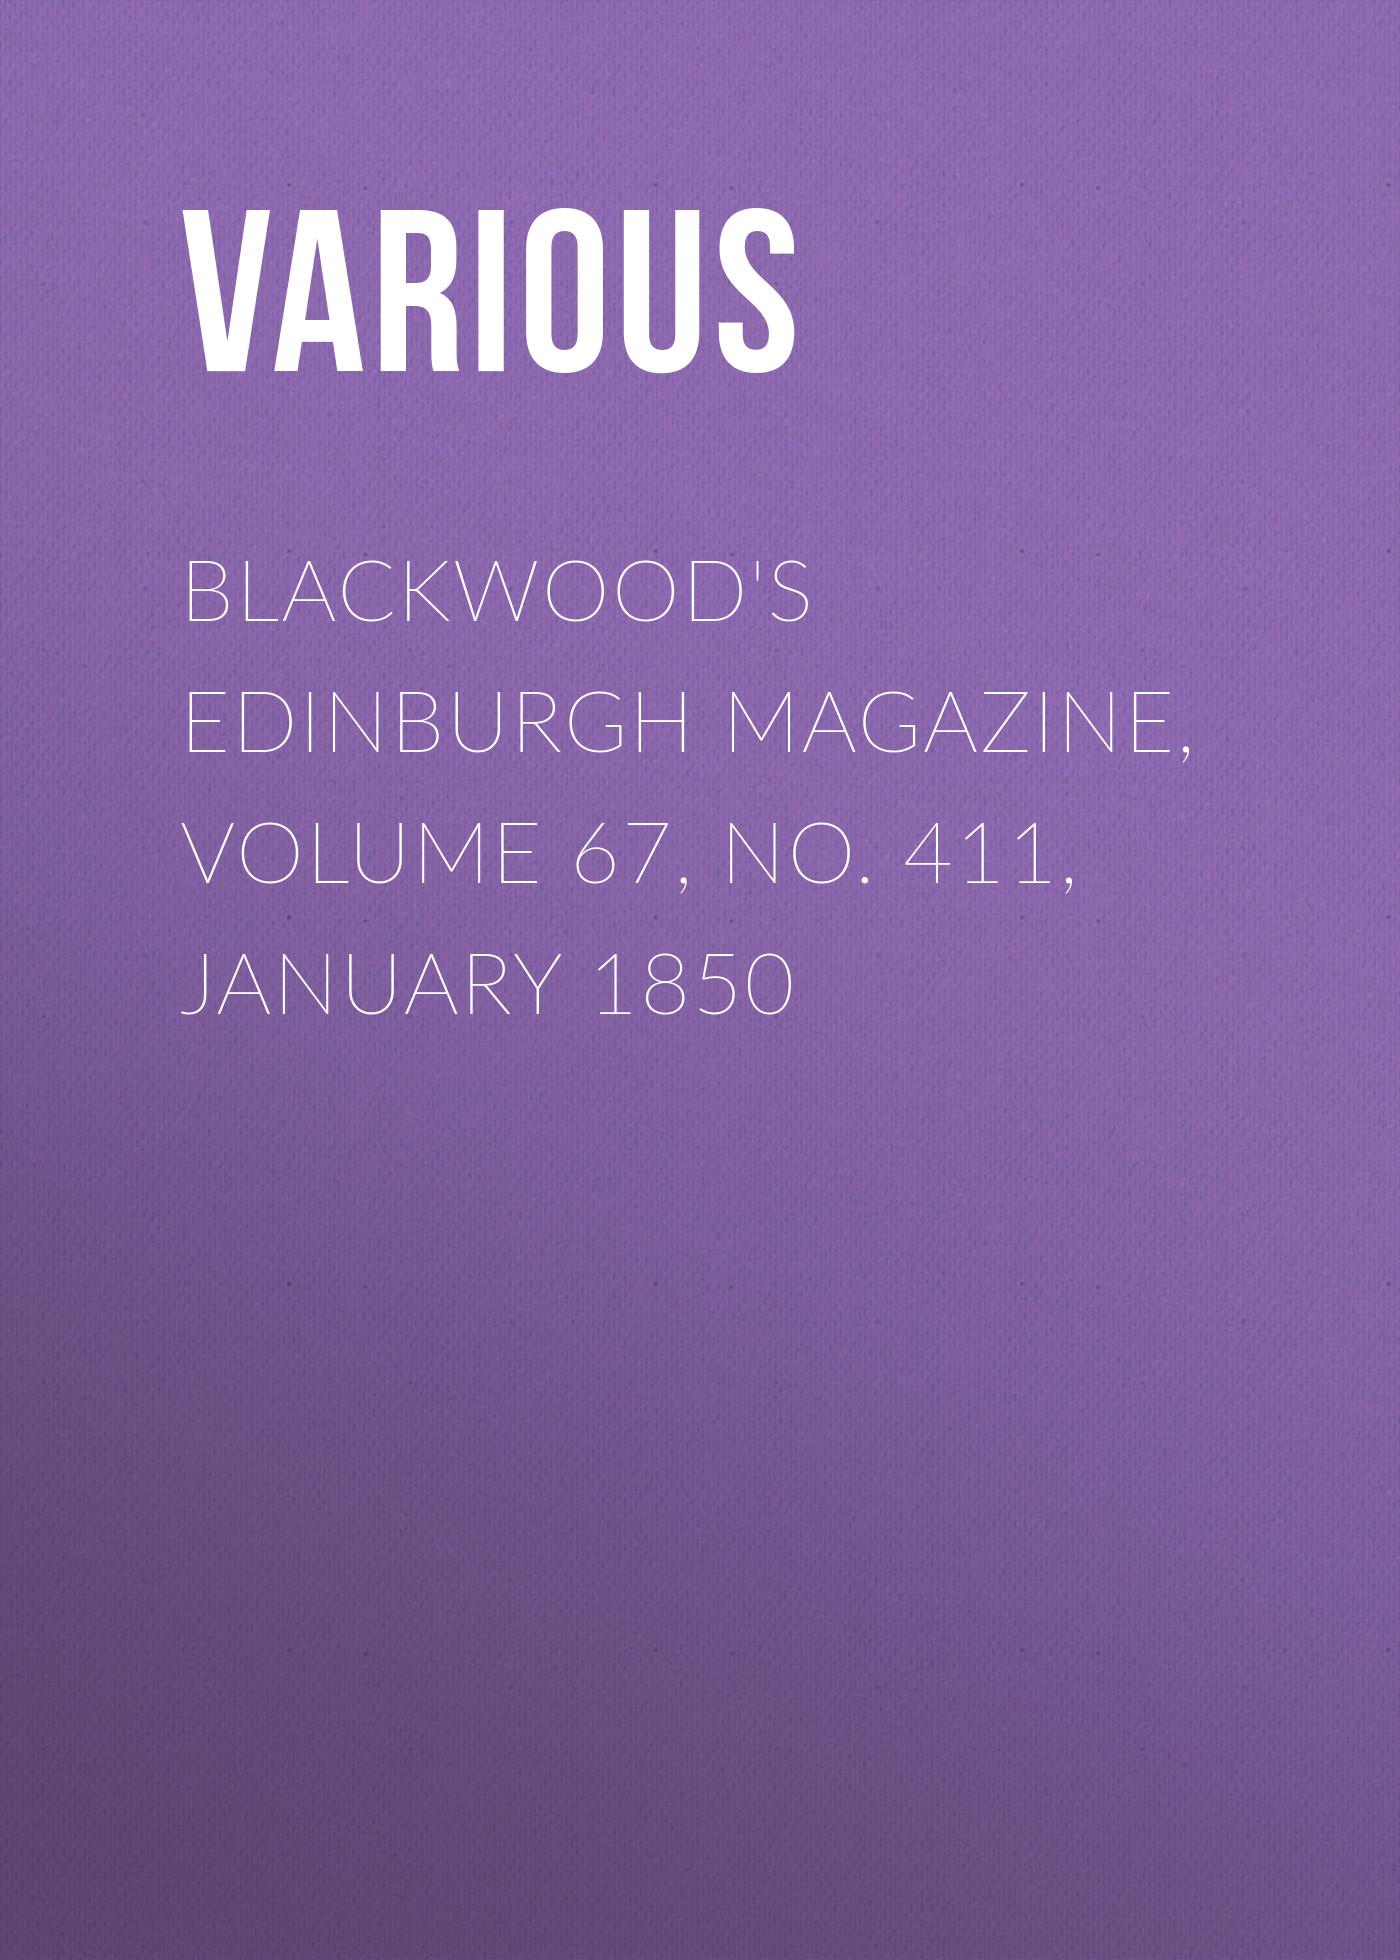 Various Blackwood's Edinburgh Magazine, Volume 67, No. 411, January 1850